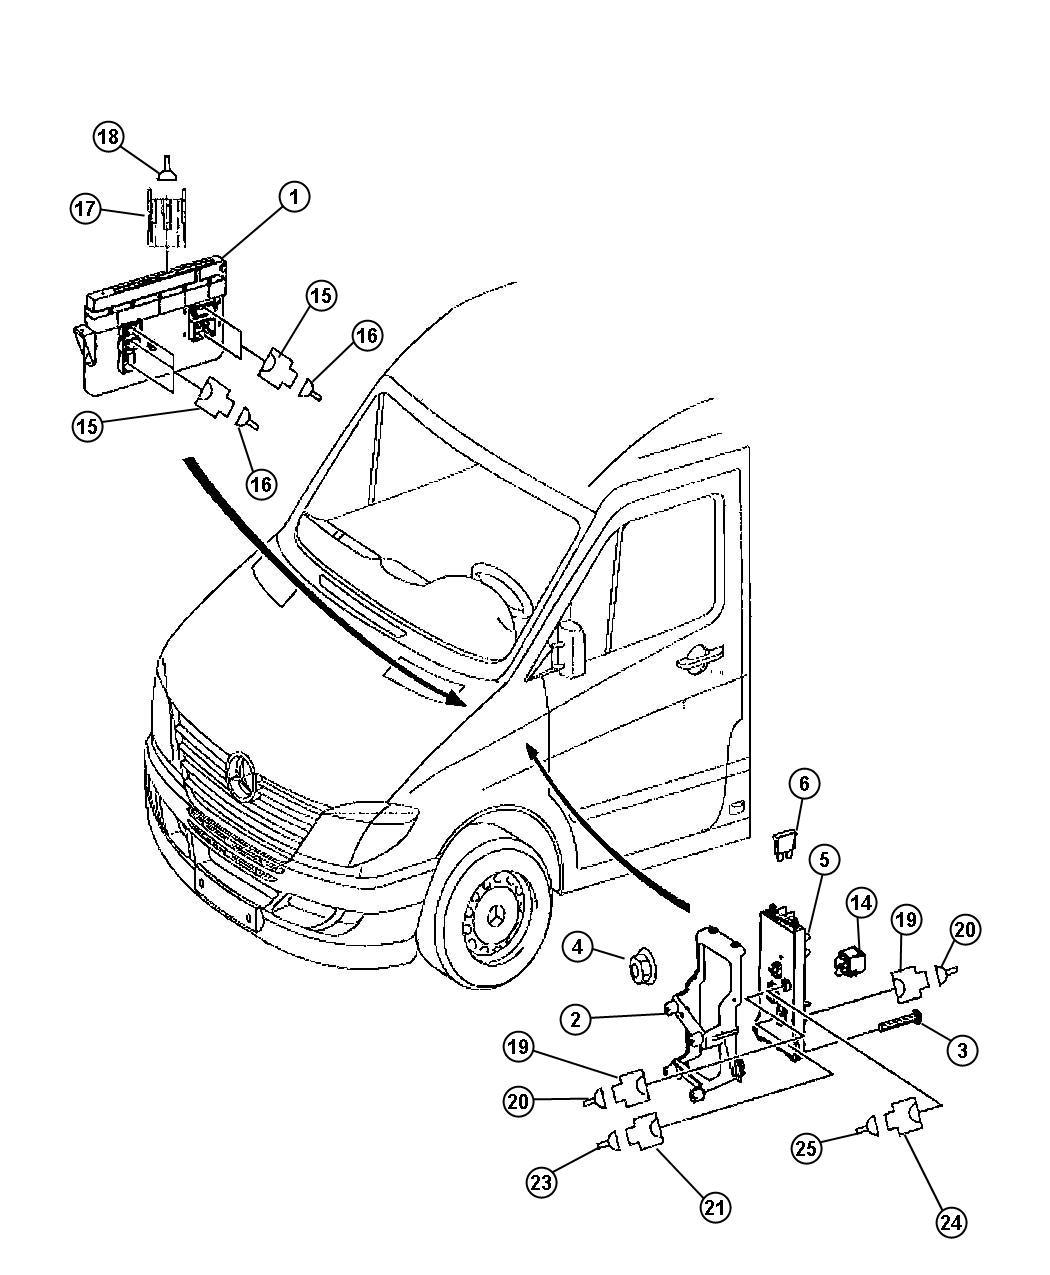 2003 Dodge Ram 2500 Fuel Filter Location